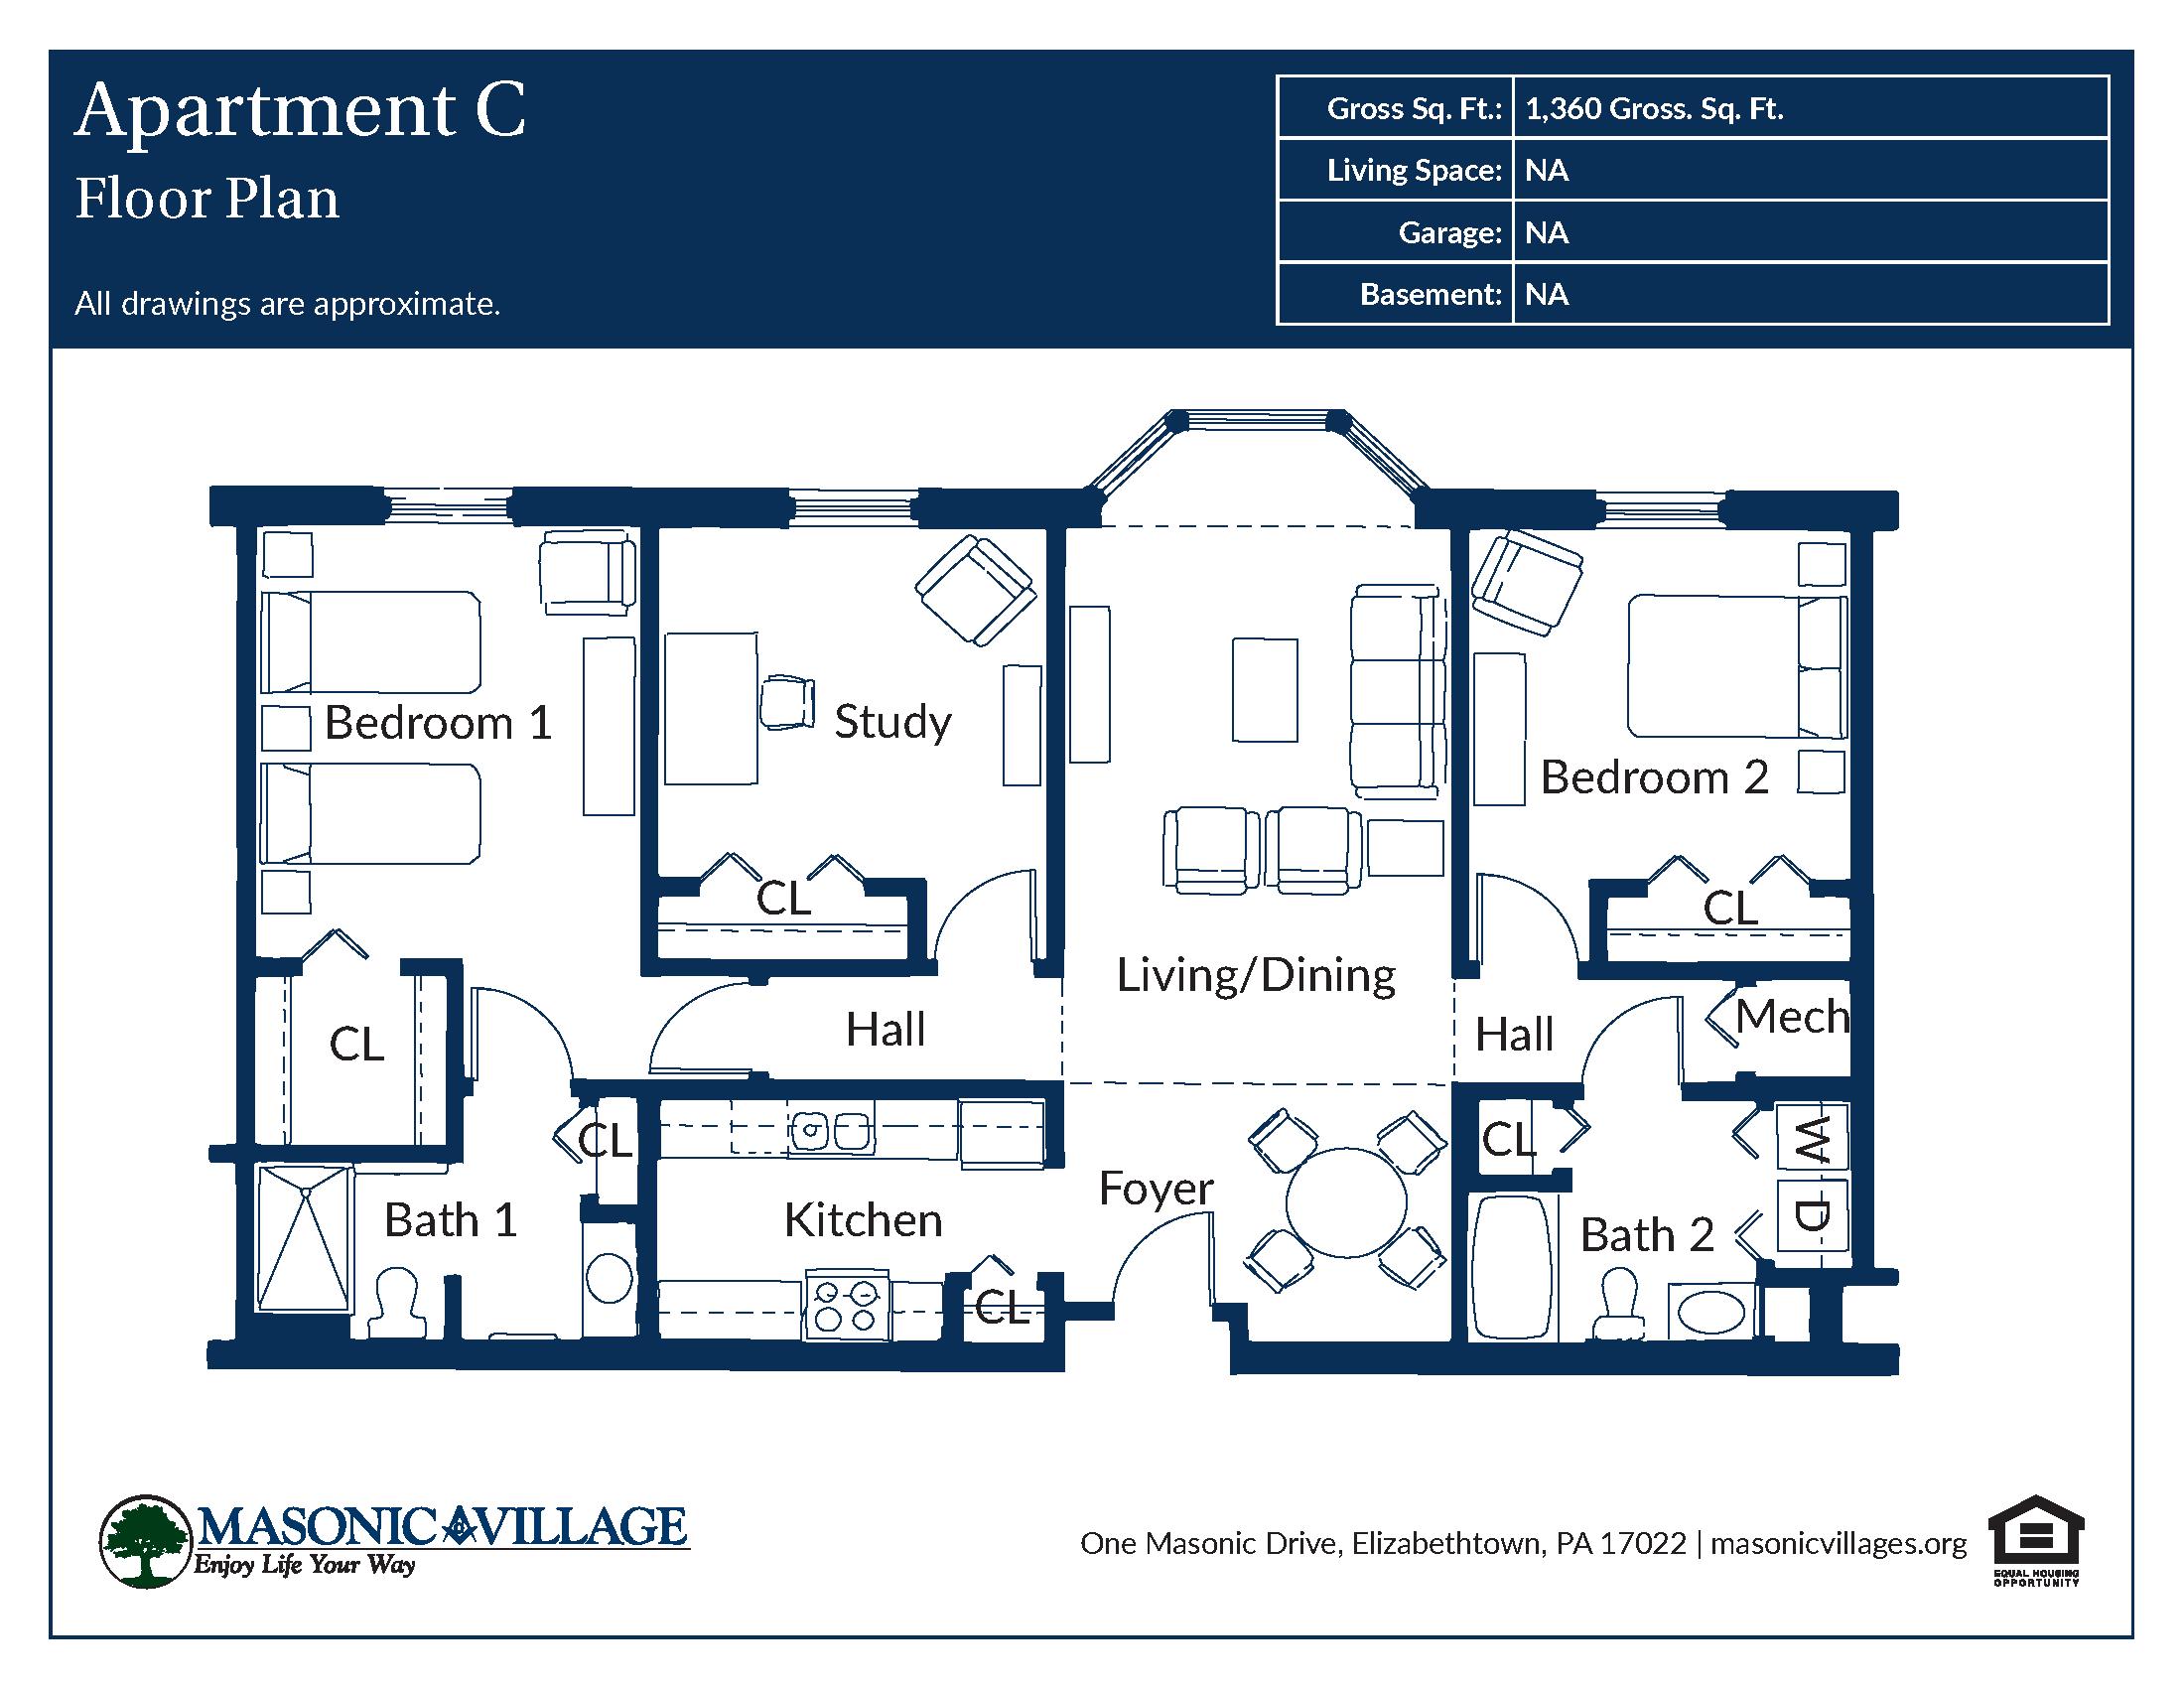 Masonic Village at Elizabethtown - Apartment C Floor Plan